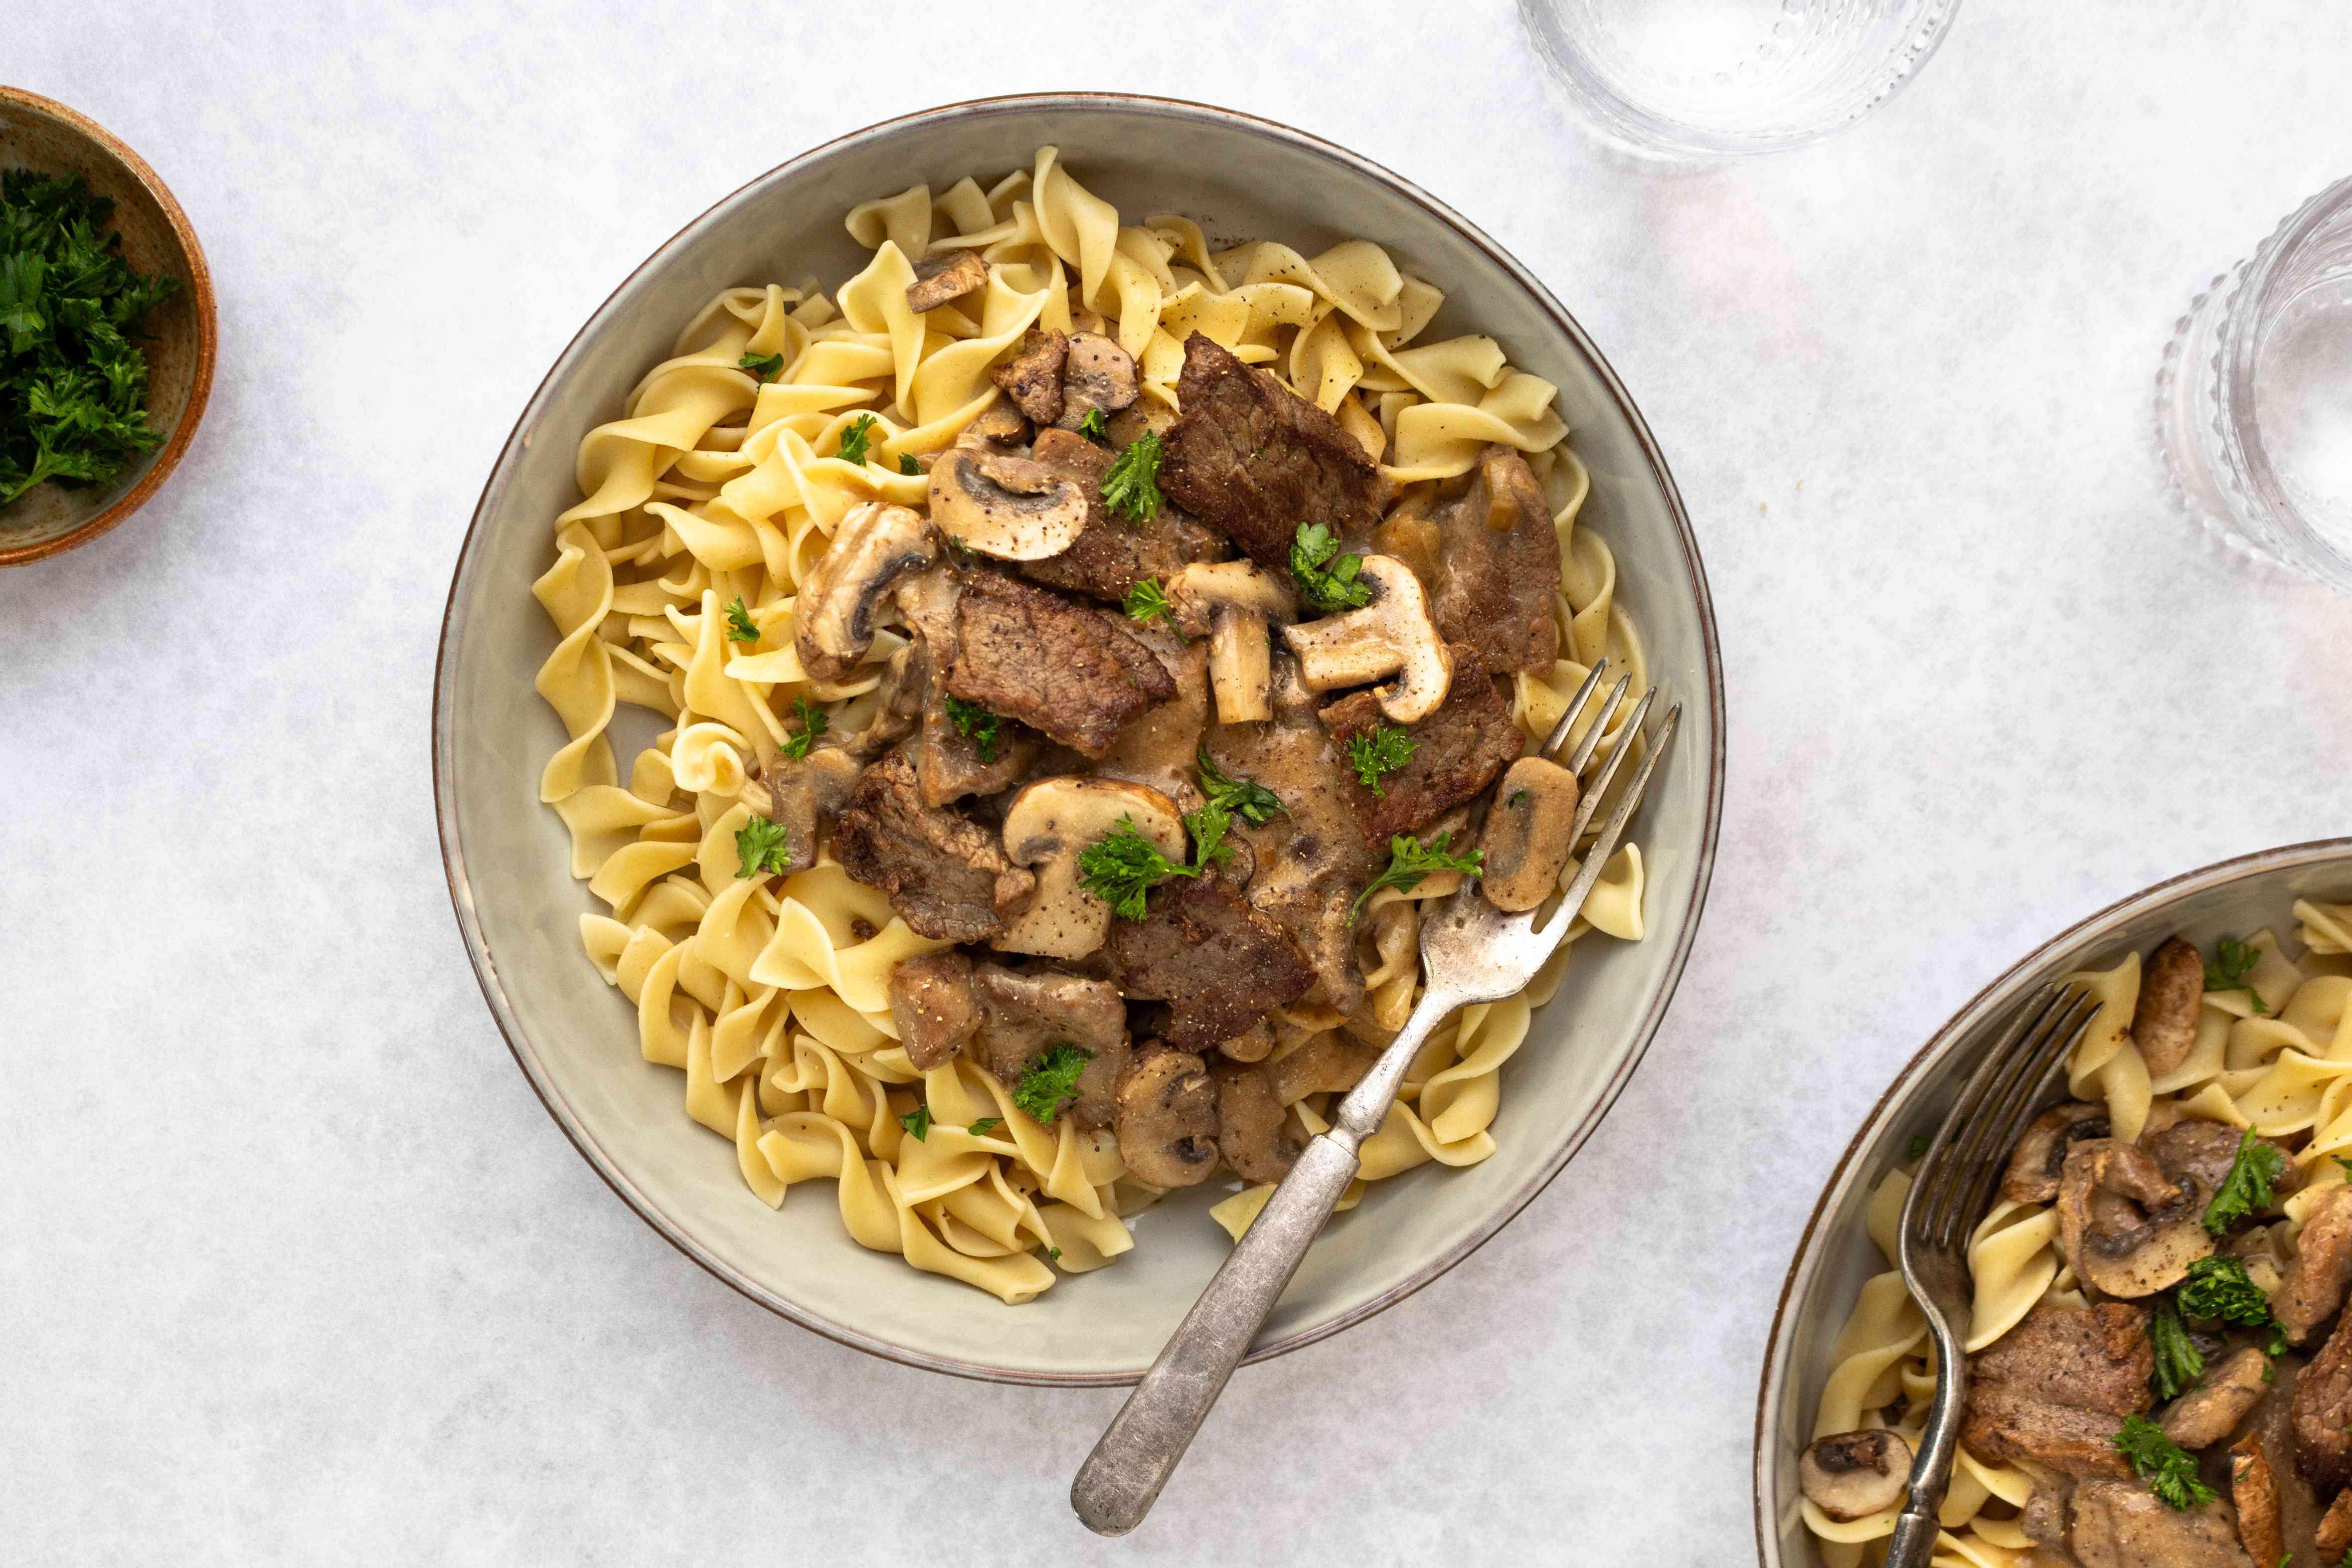 Easy Crock Pot Beef Stroganoff in a bowl